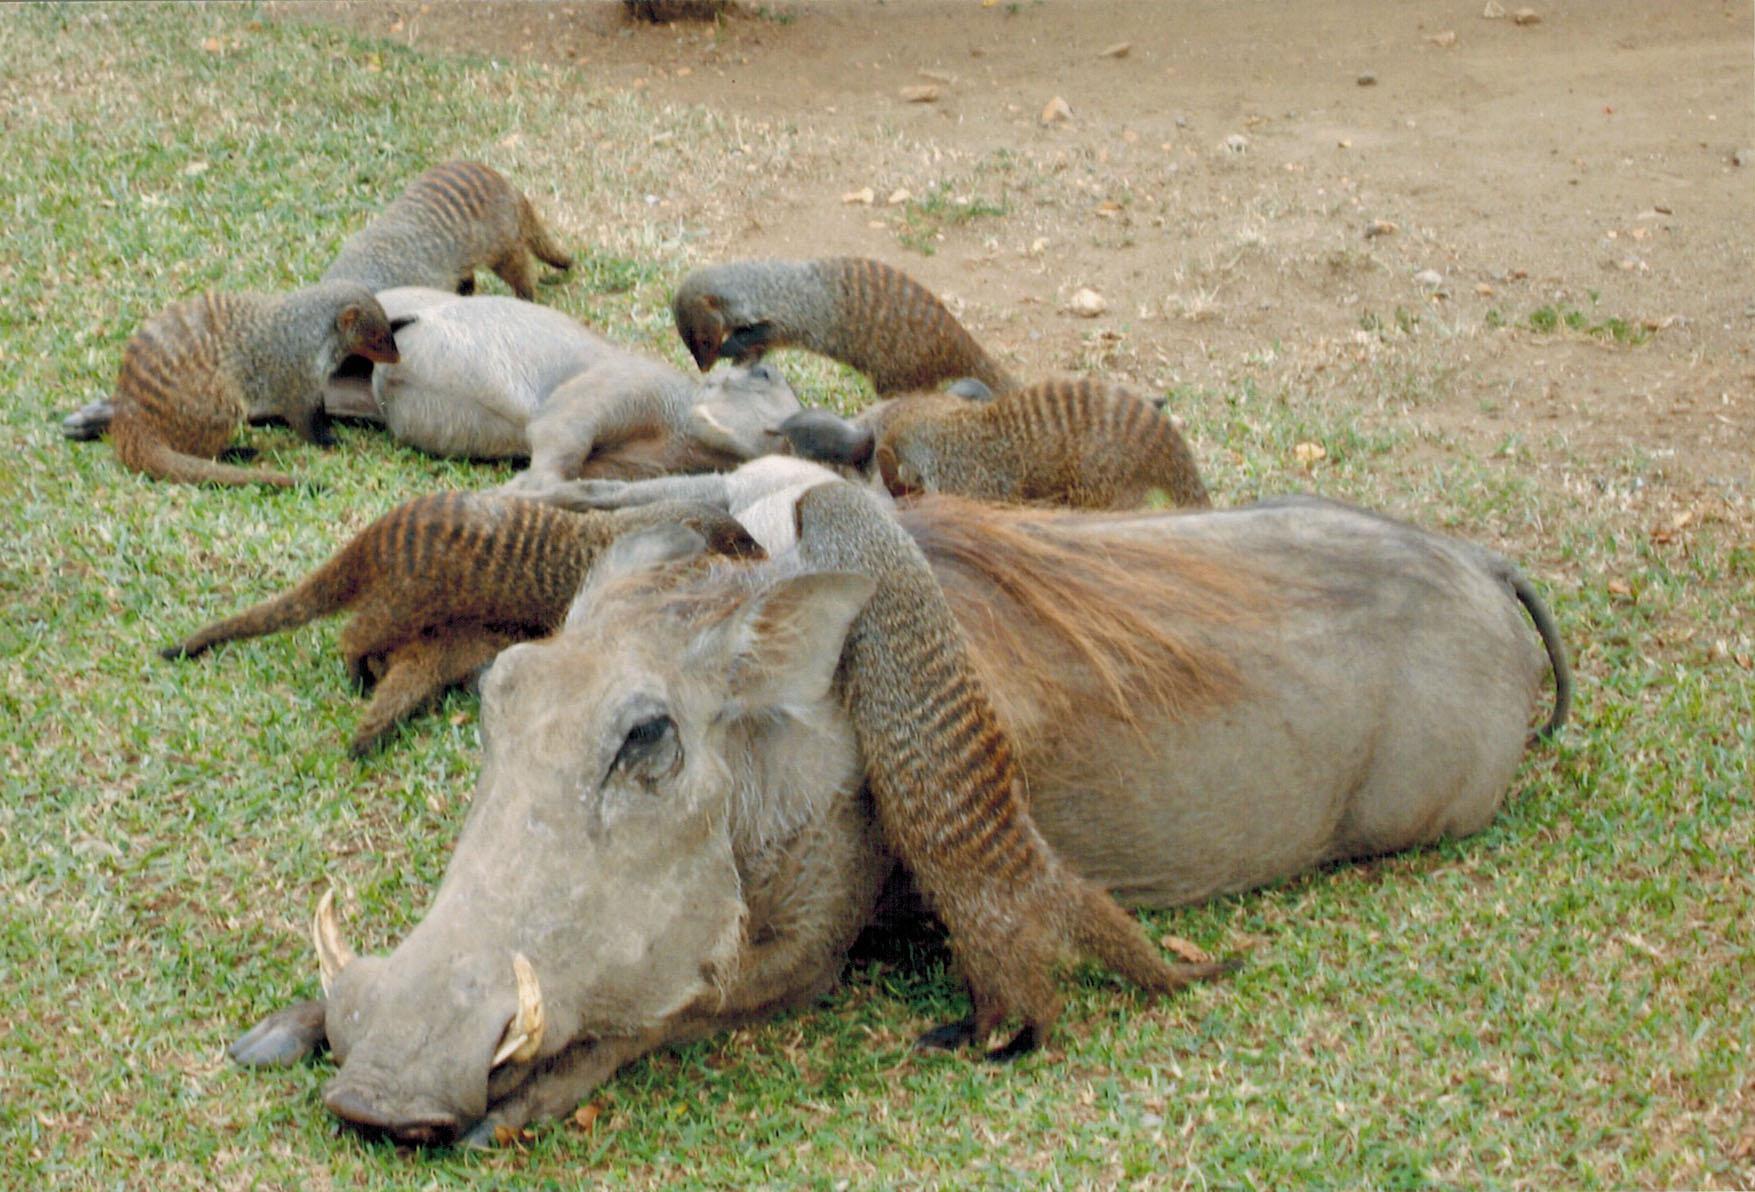 Mongoose grooming warthogs at Mweya Safari Lodge in Uganda